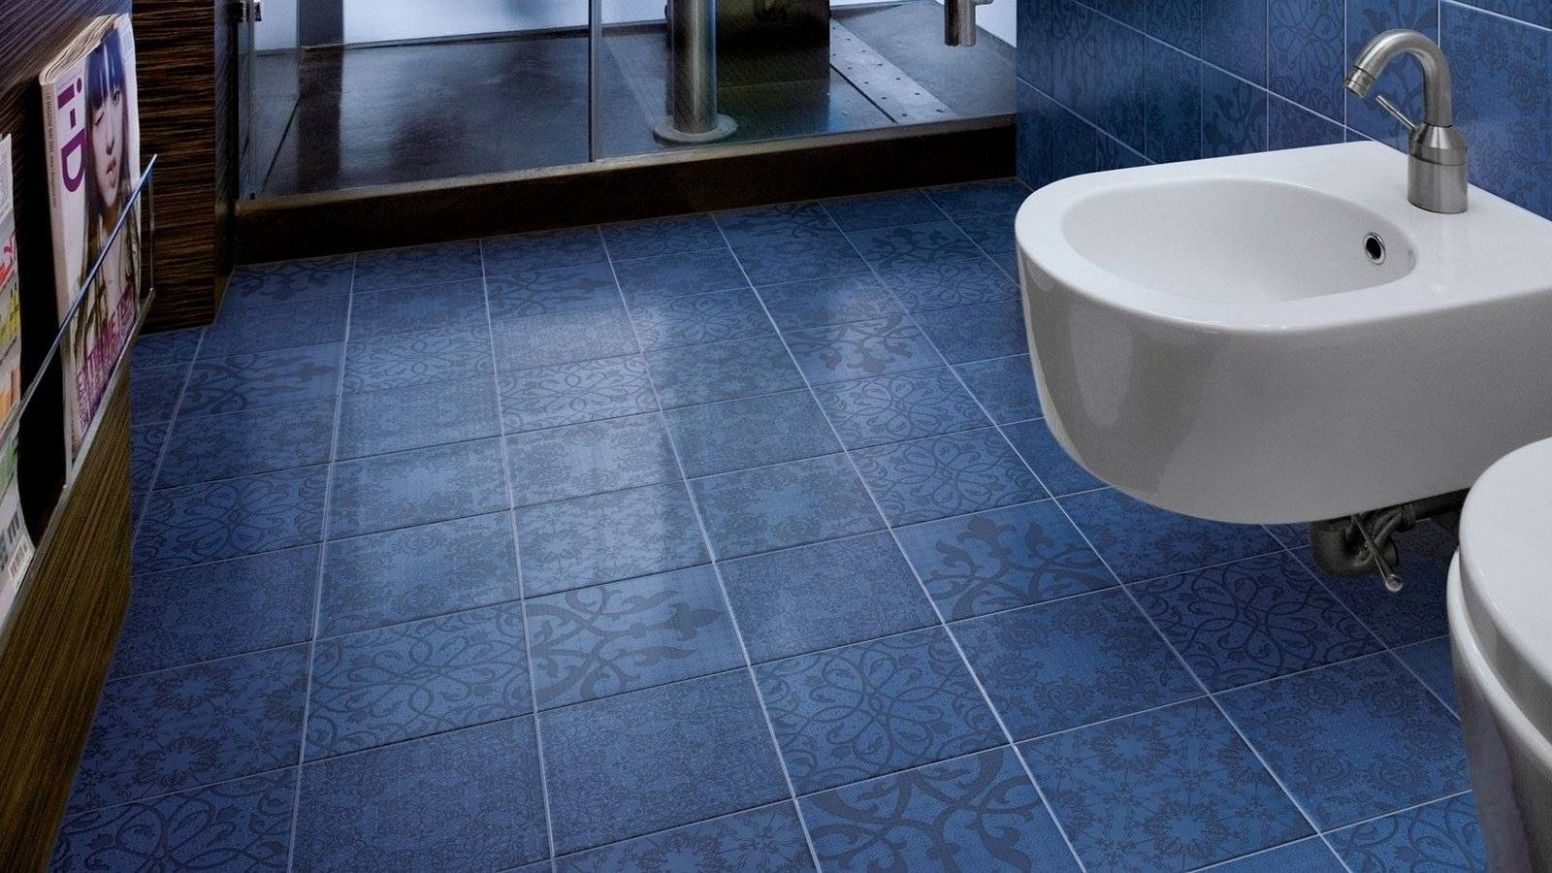 Bathroom Tiles Ideas Blue Tile Floor Bathroom Flooring Beautiful Tile Floor